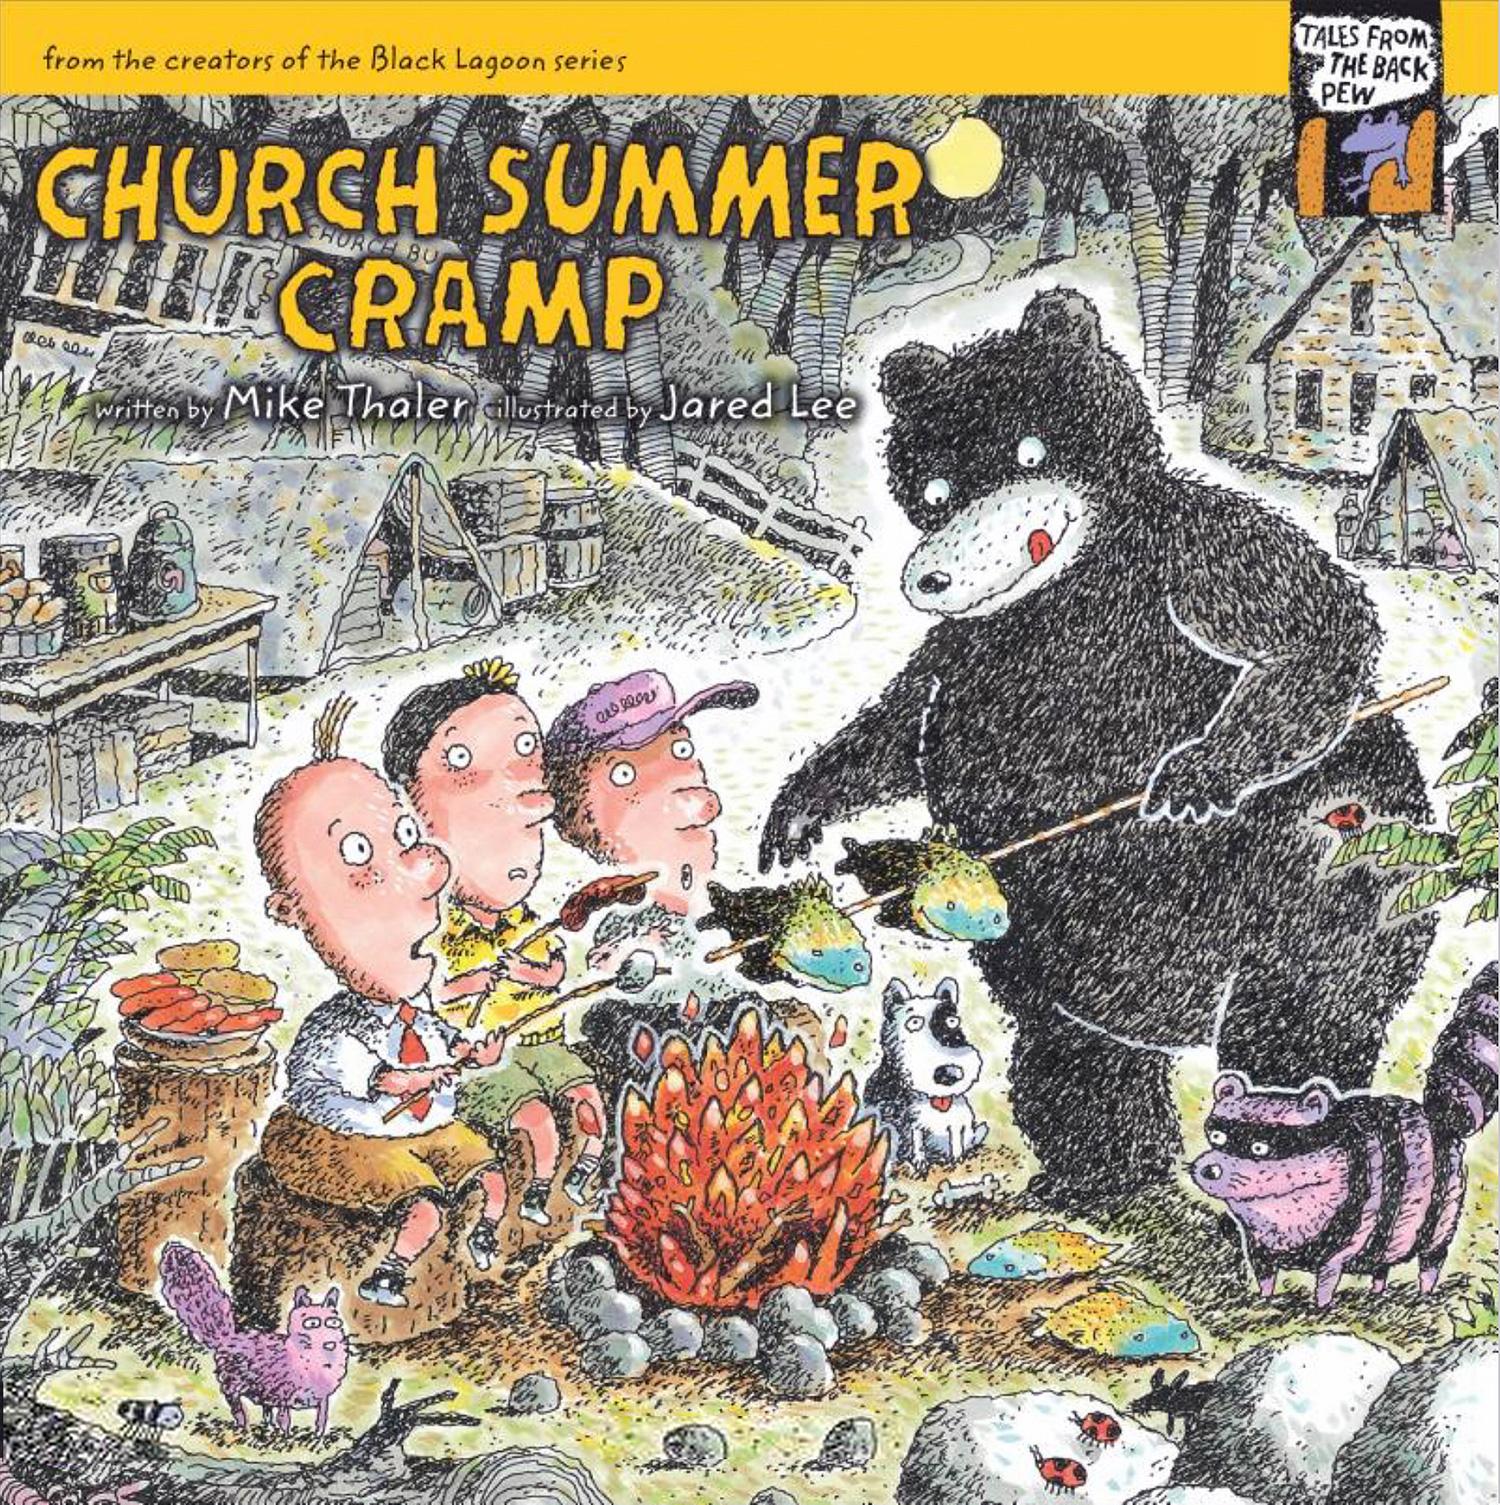 BackPew07-Church Summer Cramp